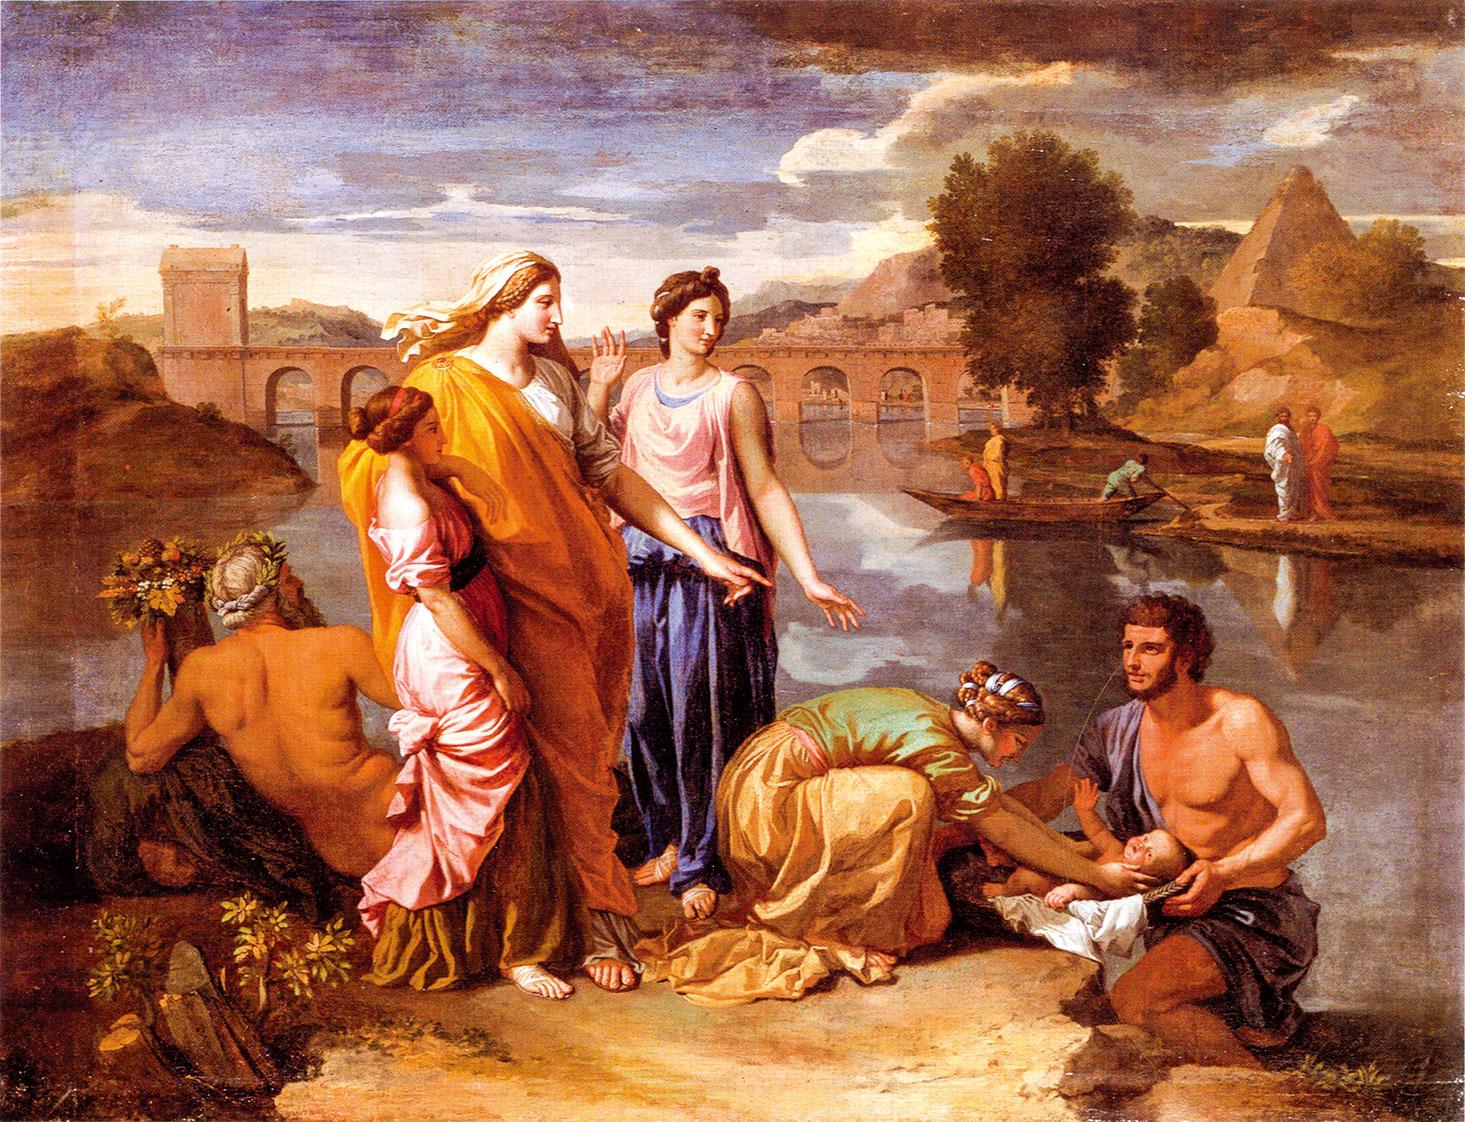 1638年作品《摩西從河中得救》(Moses Saved from the River) 。(公有領域)